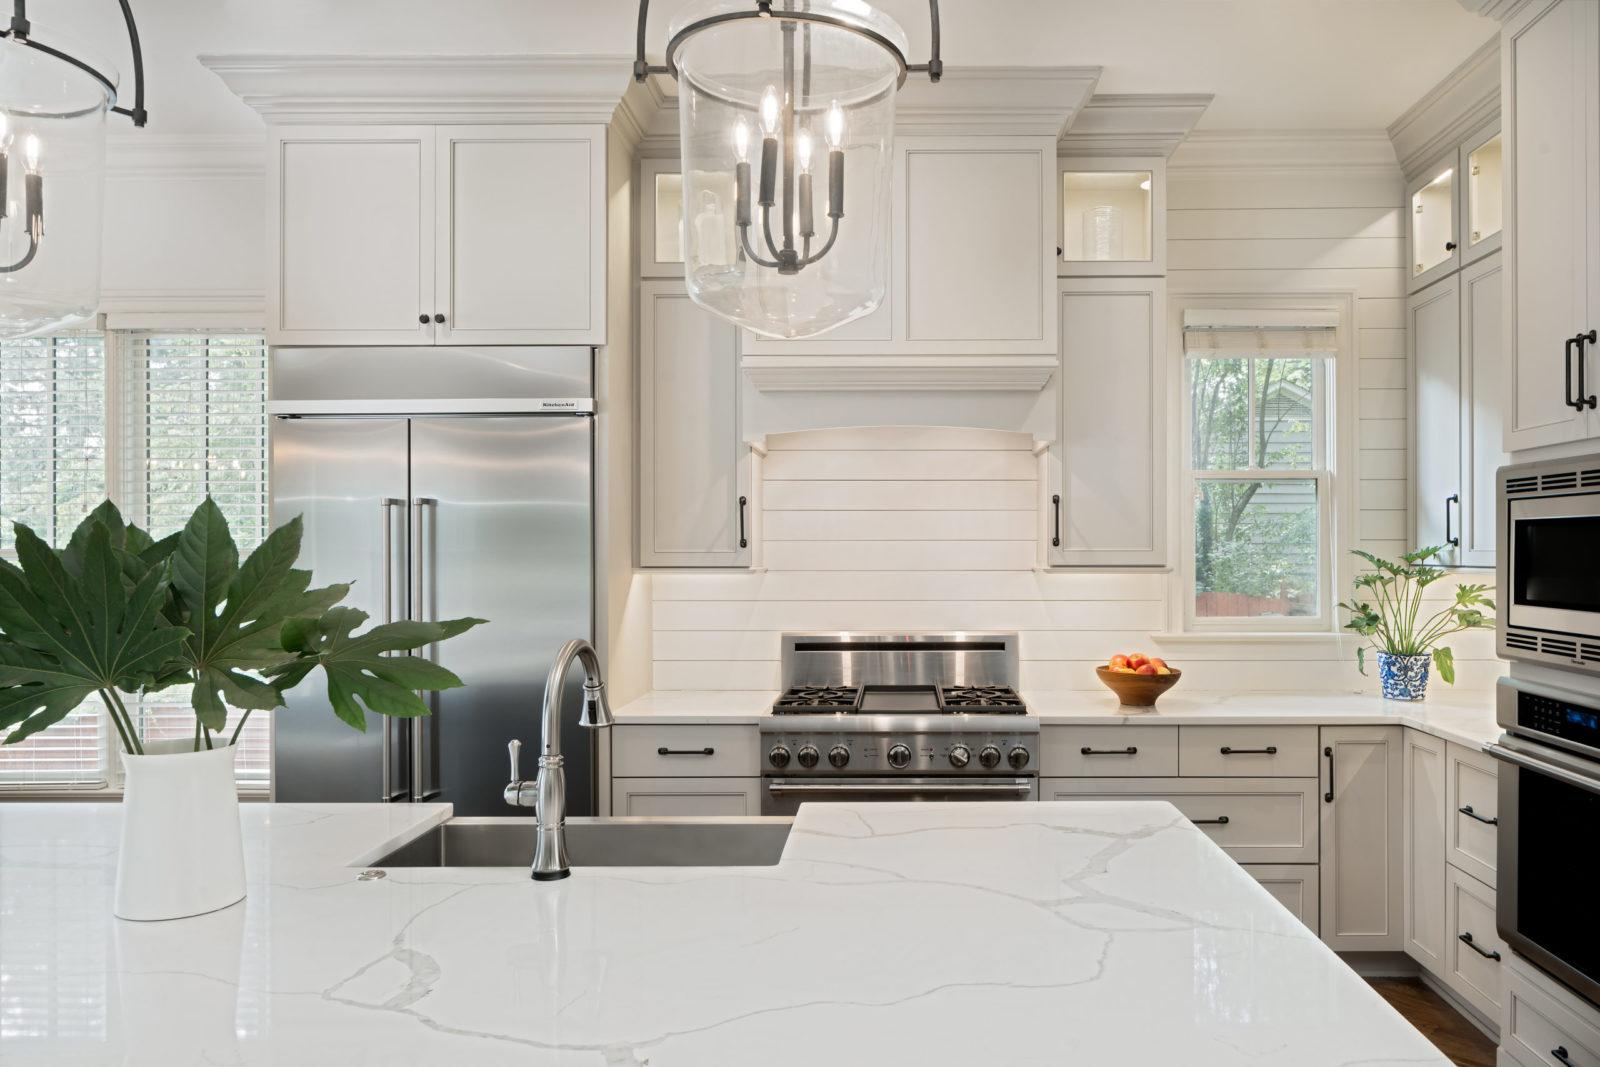 farmhouse-style-kitchen-modern-farmhouse-kitchen-shiplap-backsplash